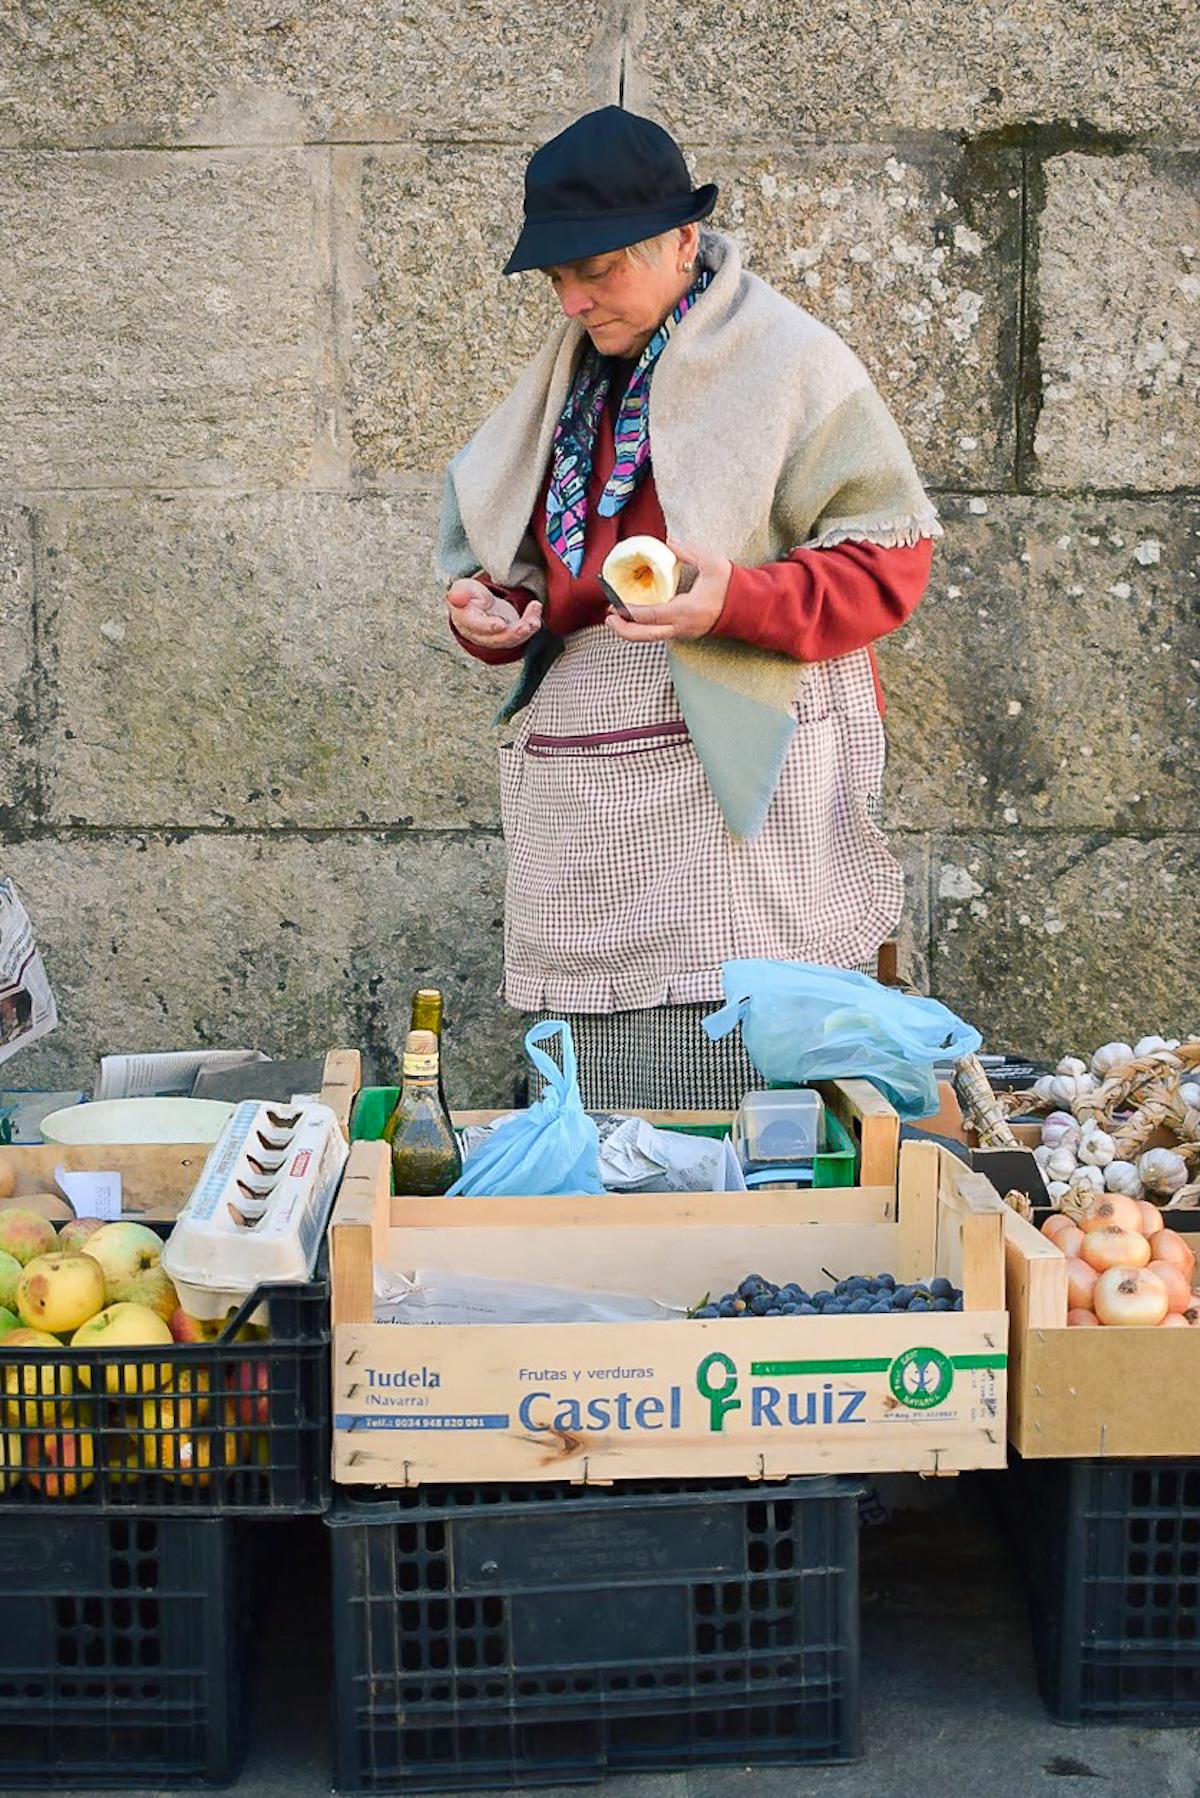 Mercado de Abastos de Santiago- Market - by Ben Holbrook